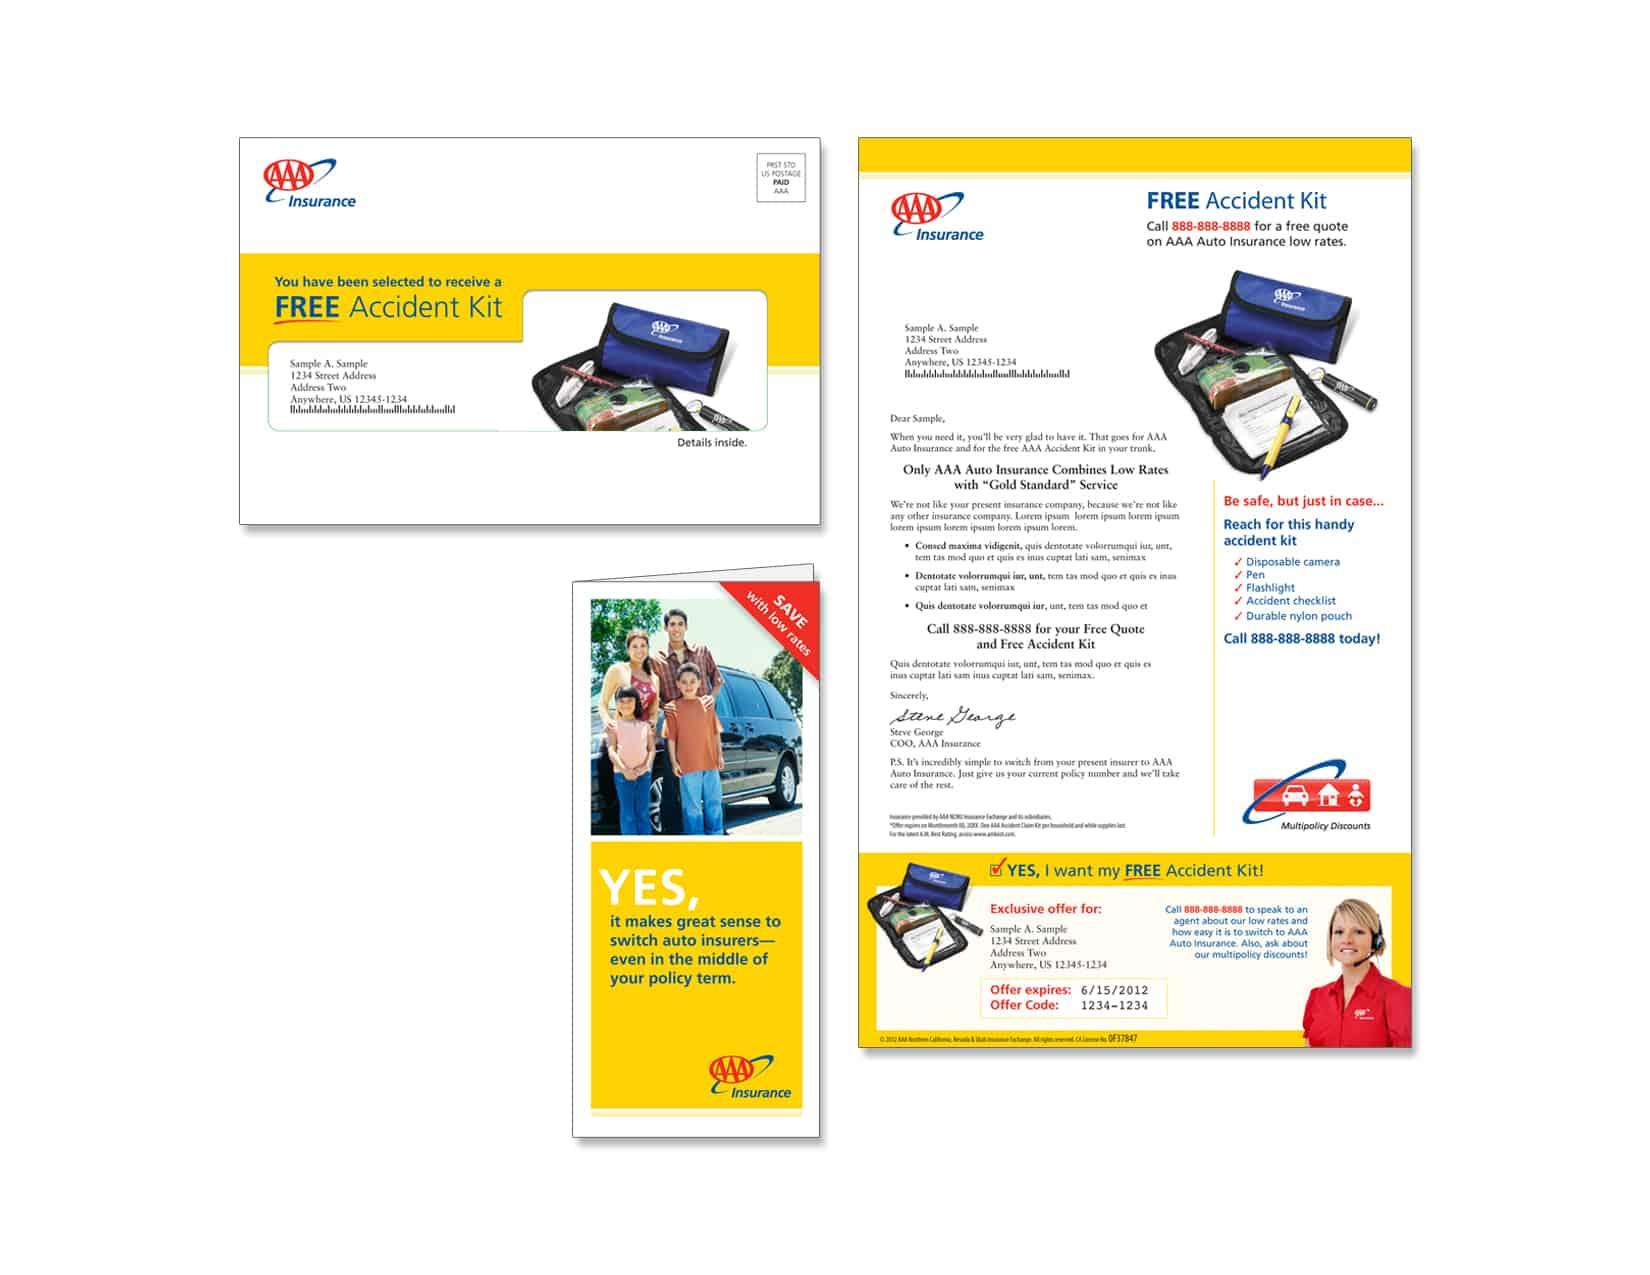 AAA-Insurance-1460-0112-5 Get Inspired For Call Aaa Auto Insurance @autoinsuranceluck.xyz